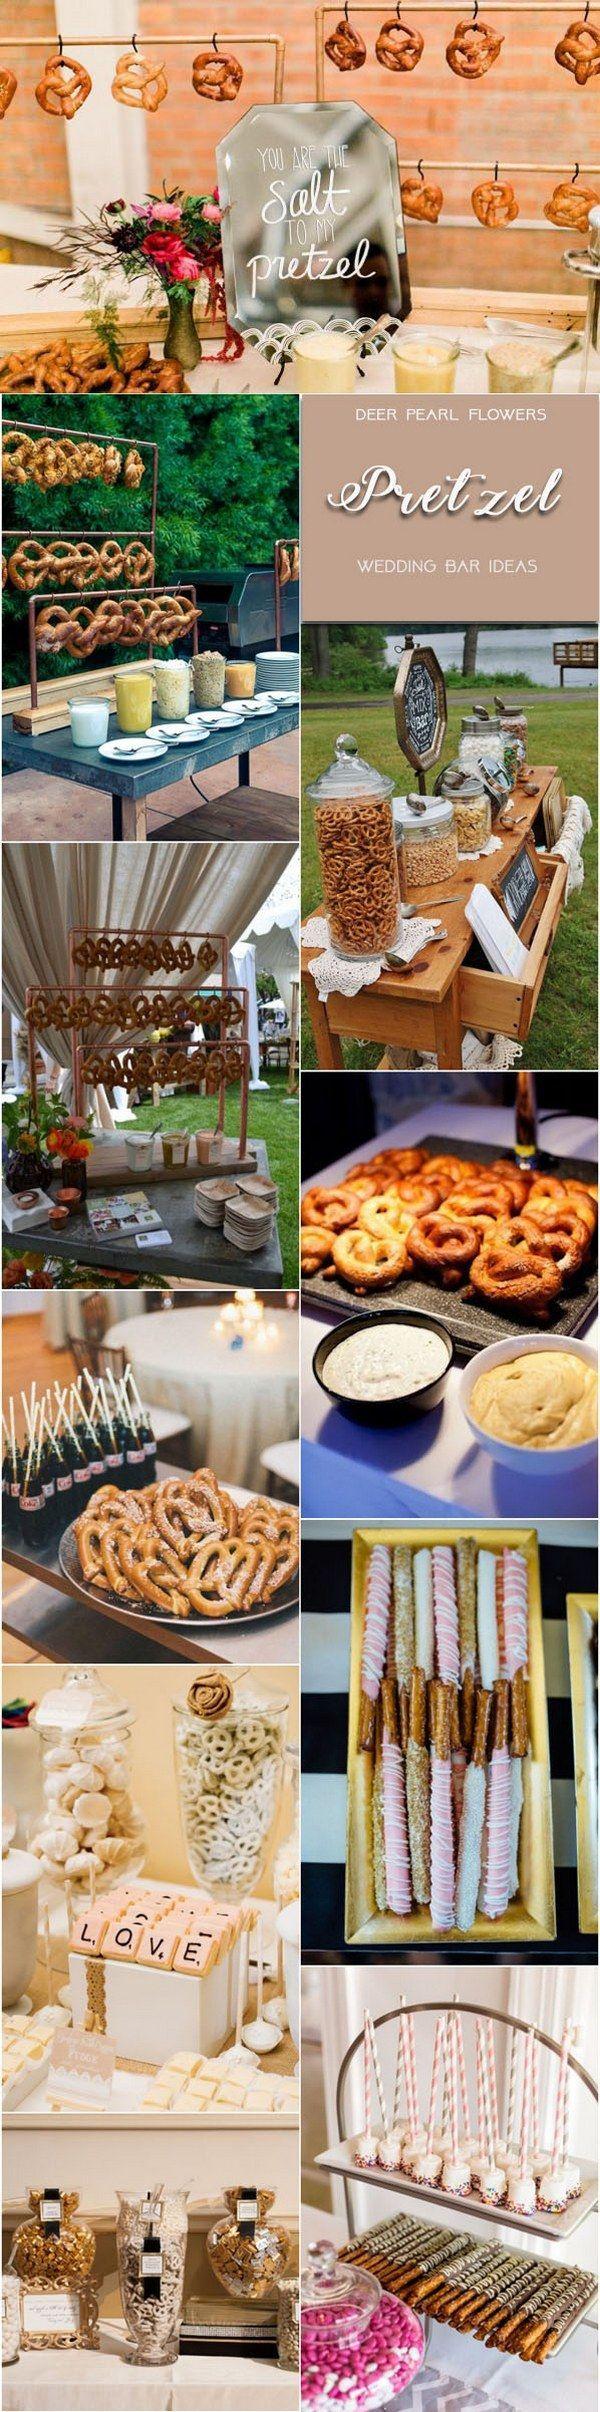 Rustic Pretzel Wedding Dessert Food Bar For Wedding Reception Http